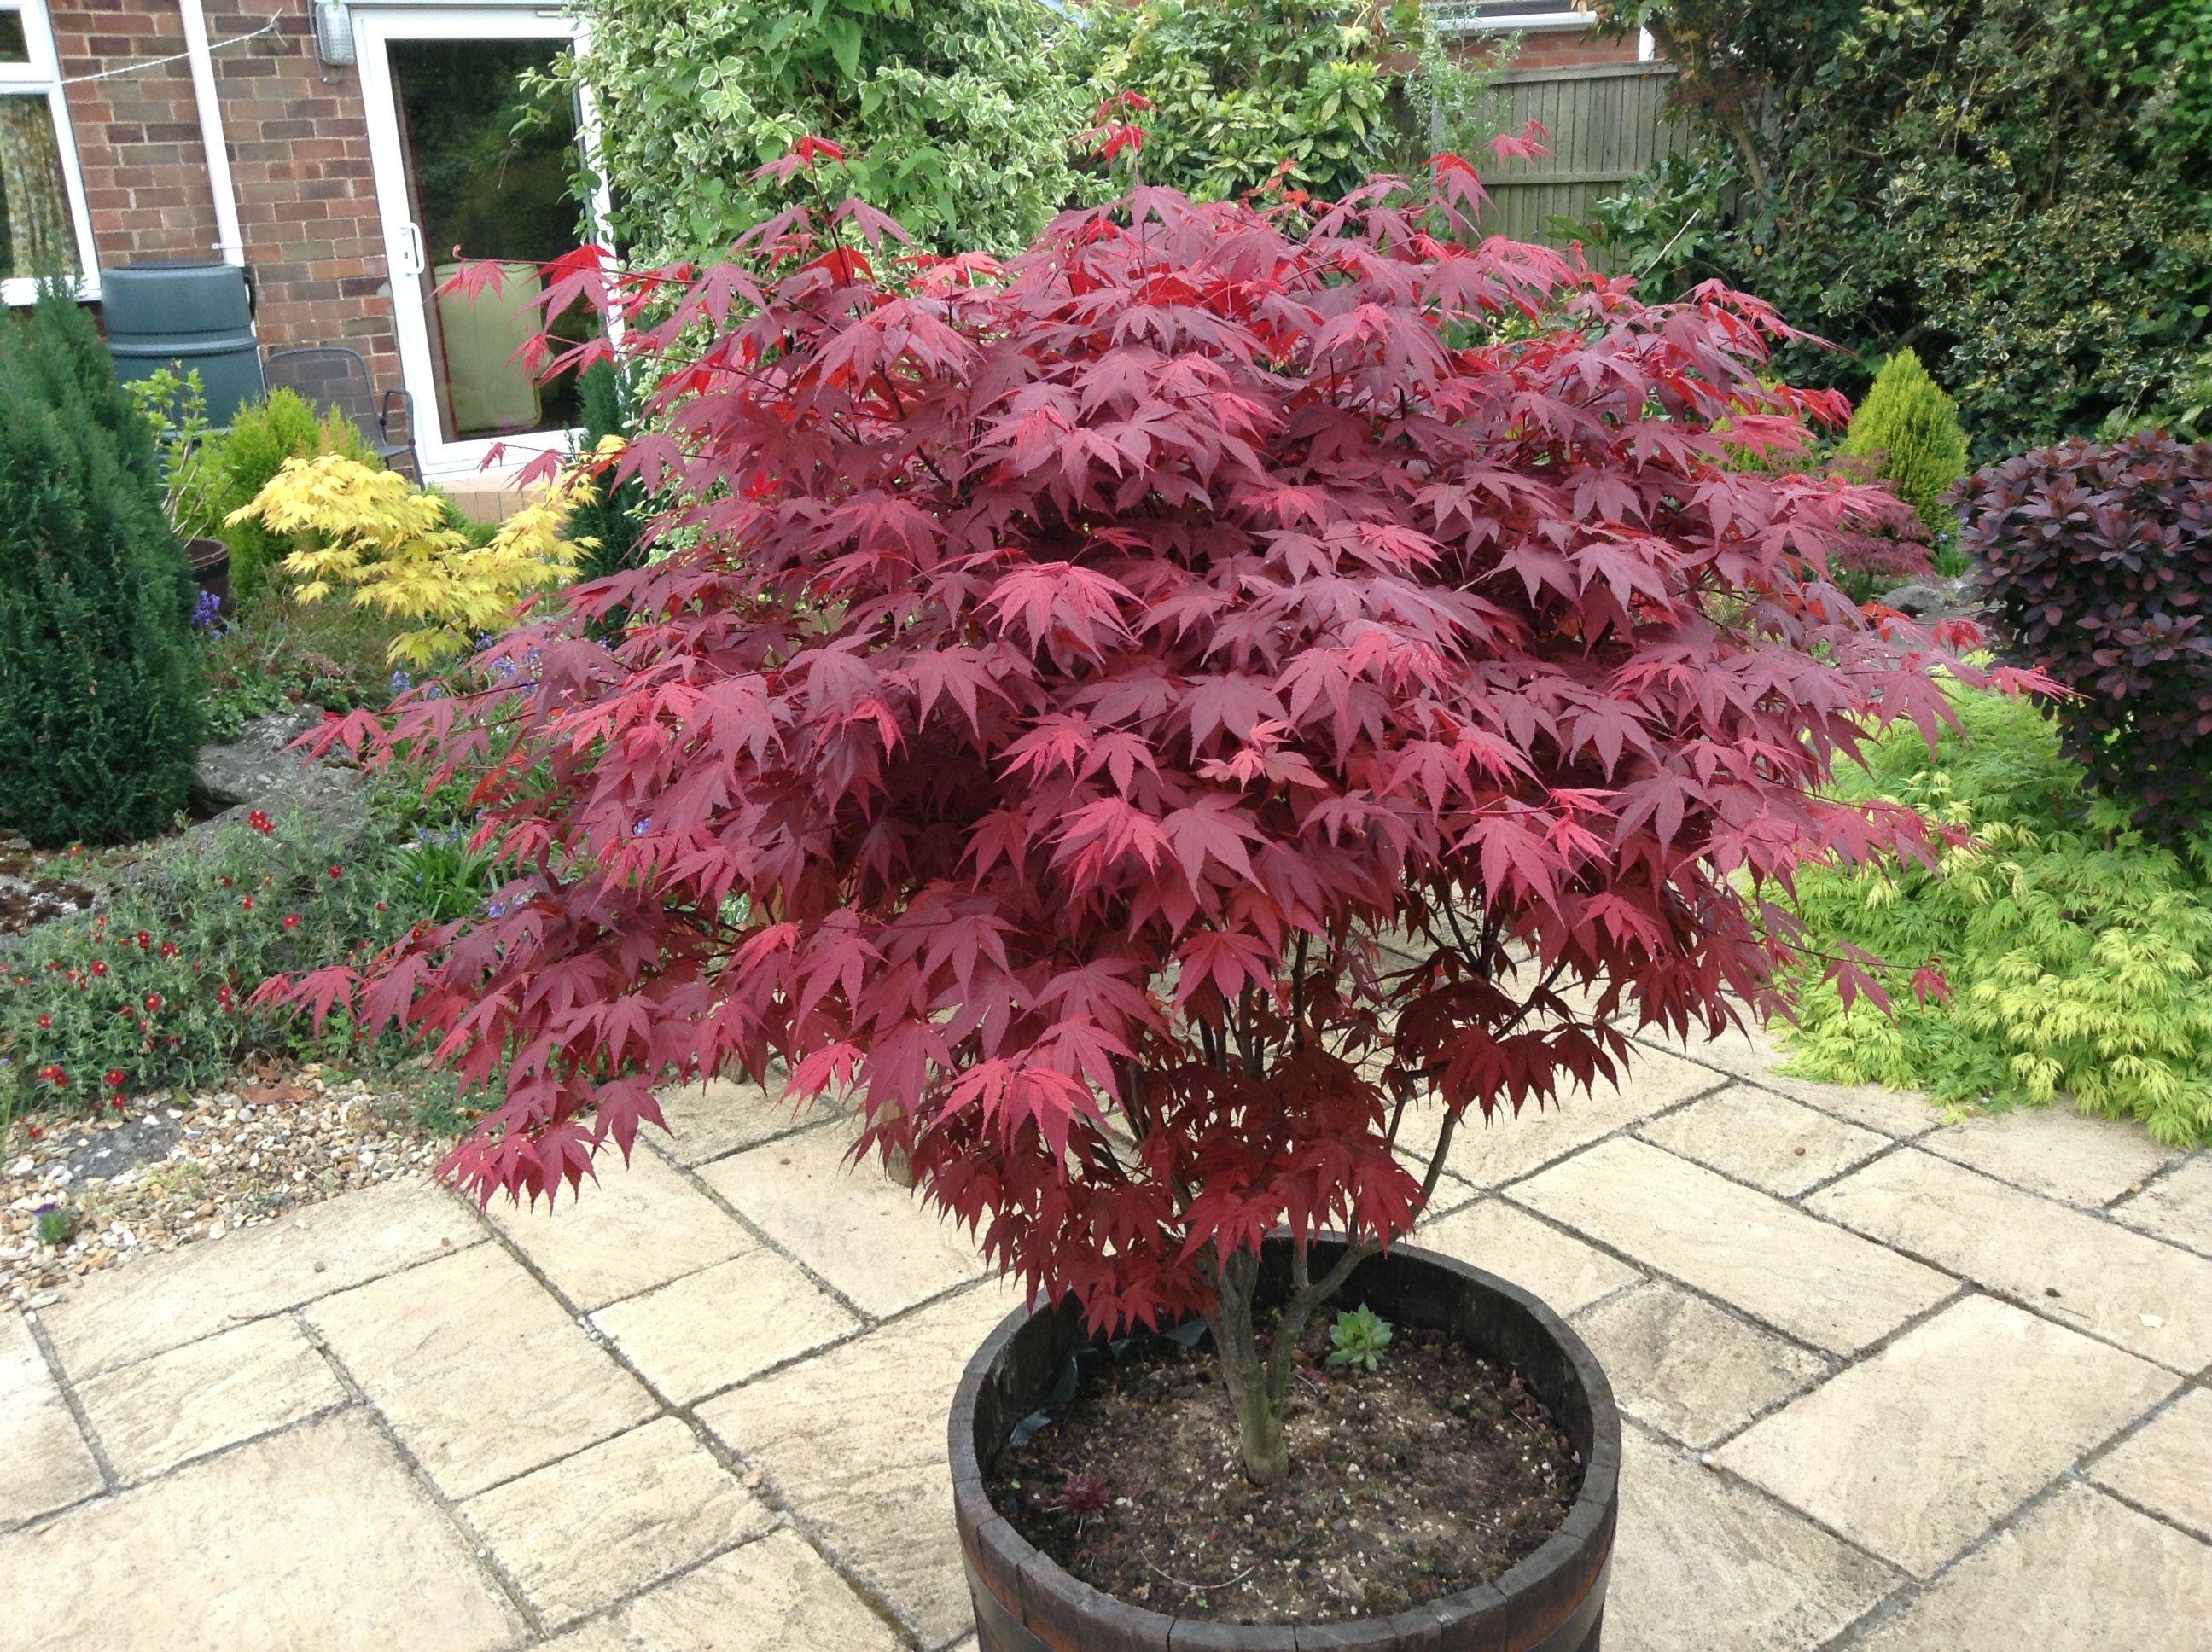 5ccbe6543ac98e4dee777762fa828c8f - Japanese Maple Trees For Small Gardens